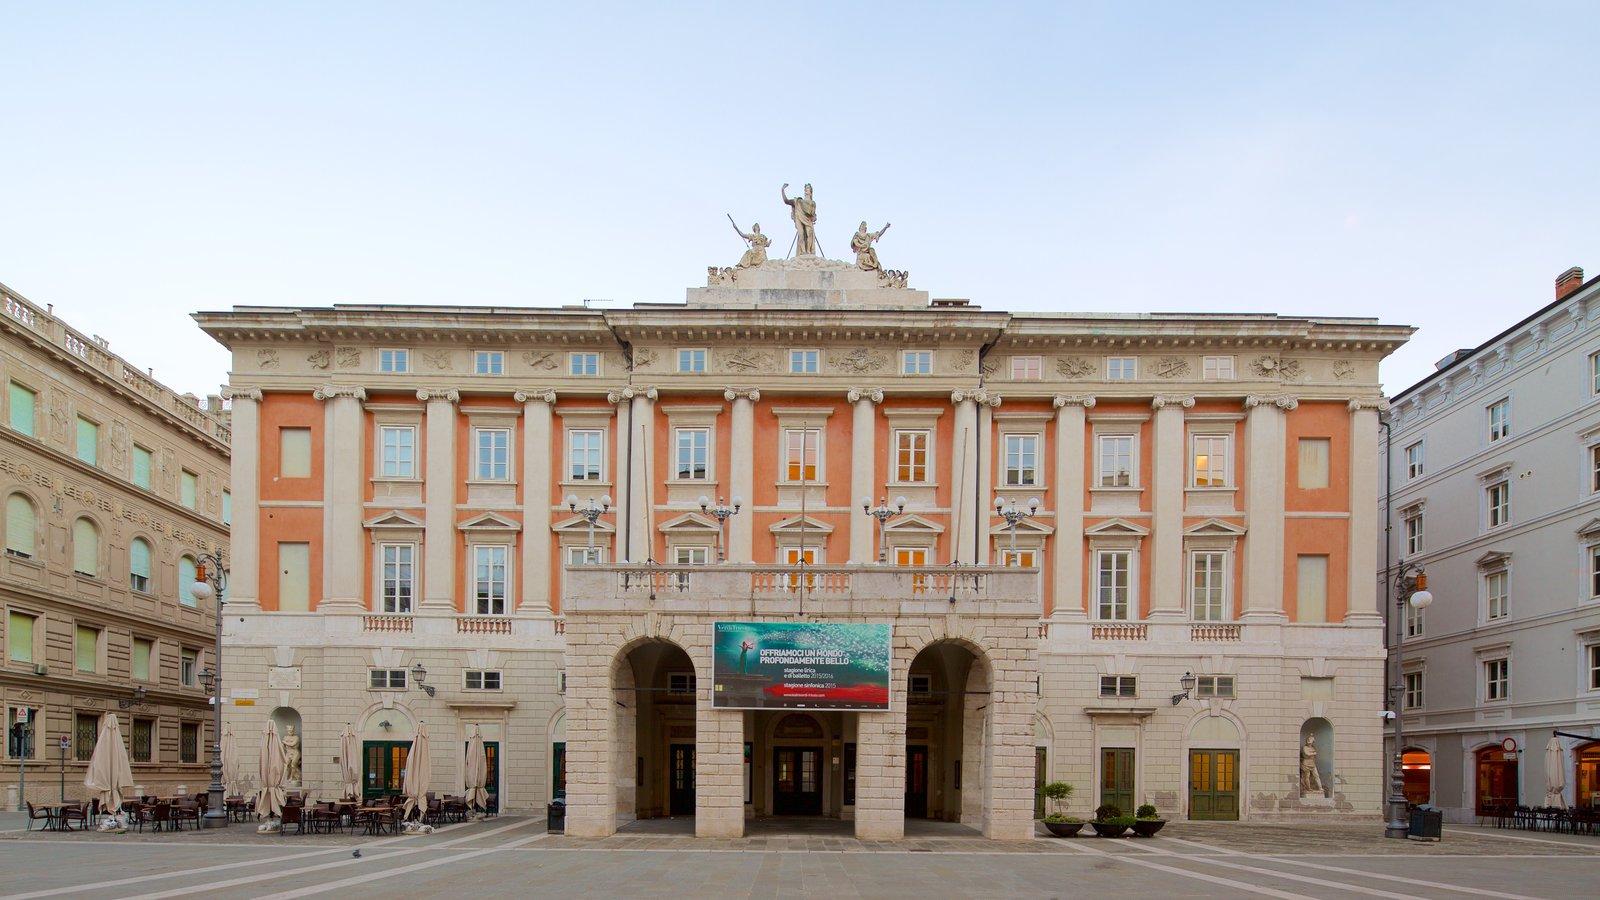 Teatro Lirico Giuseppe Verdi featuring a square or plaza and heritage architecture